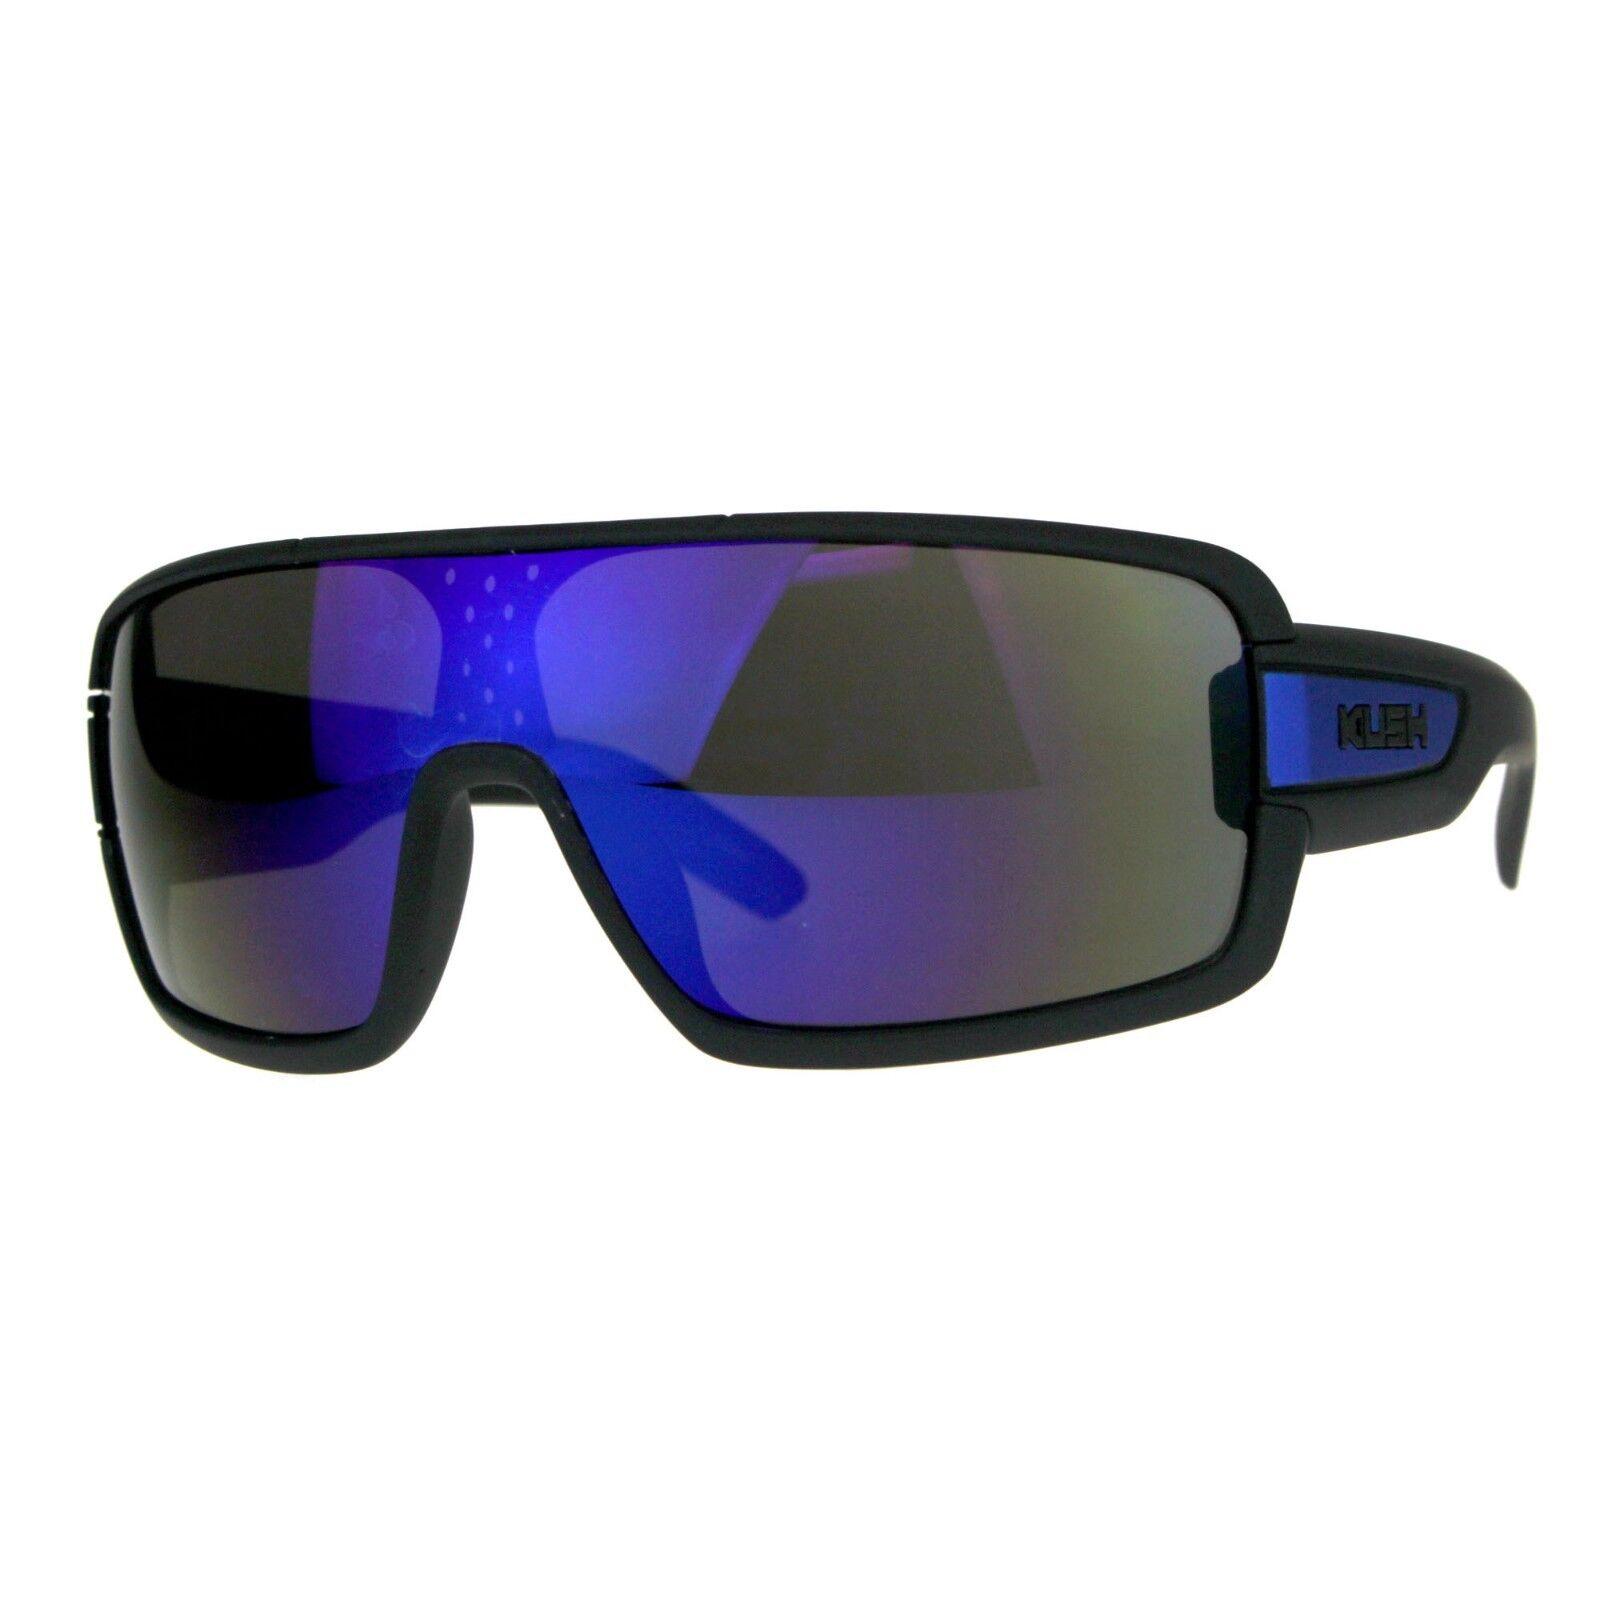 KUSH Goggle Sunglasses Mens Matted Black Shield Frame Mirror